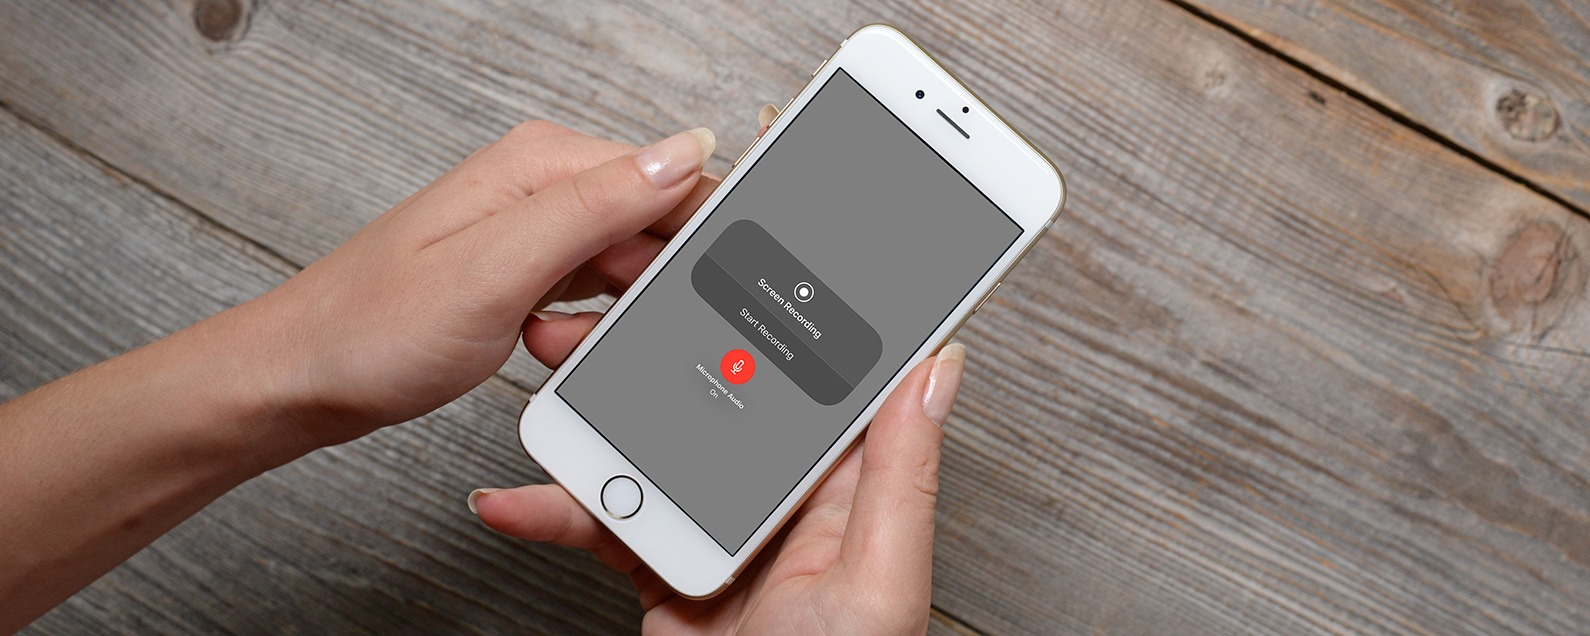 iphone record audio